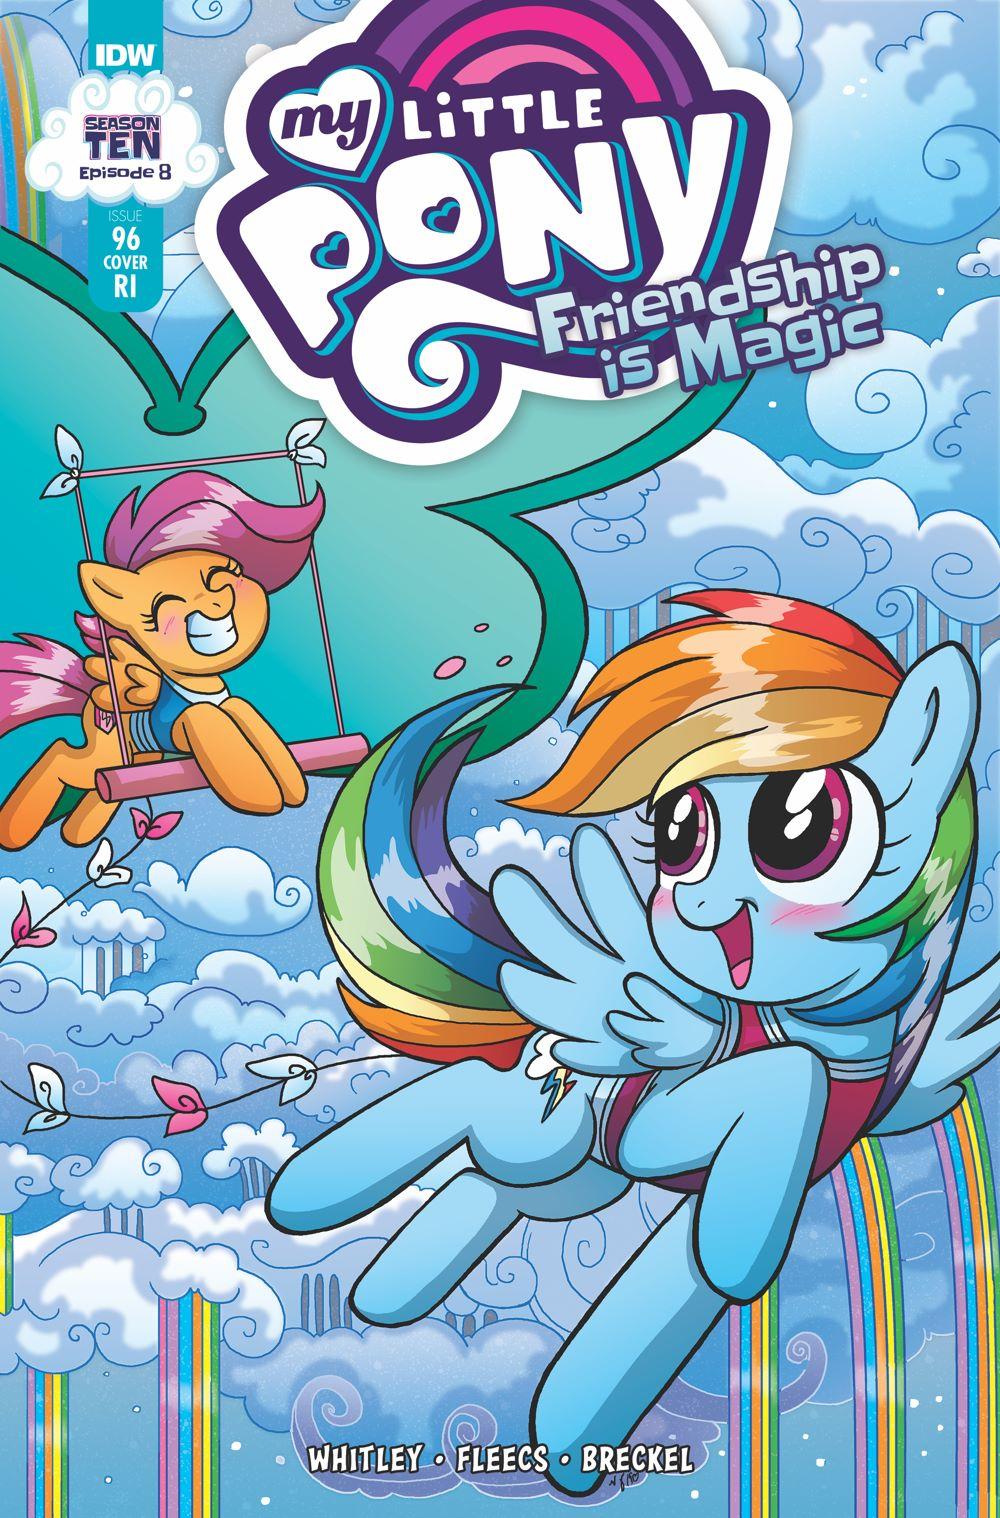 MLP96_08-coverRI ComicList Previews: MY LITTLE PONY FRIENDSHIP IS MAGIC #96